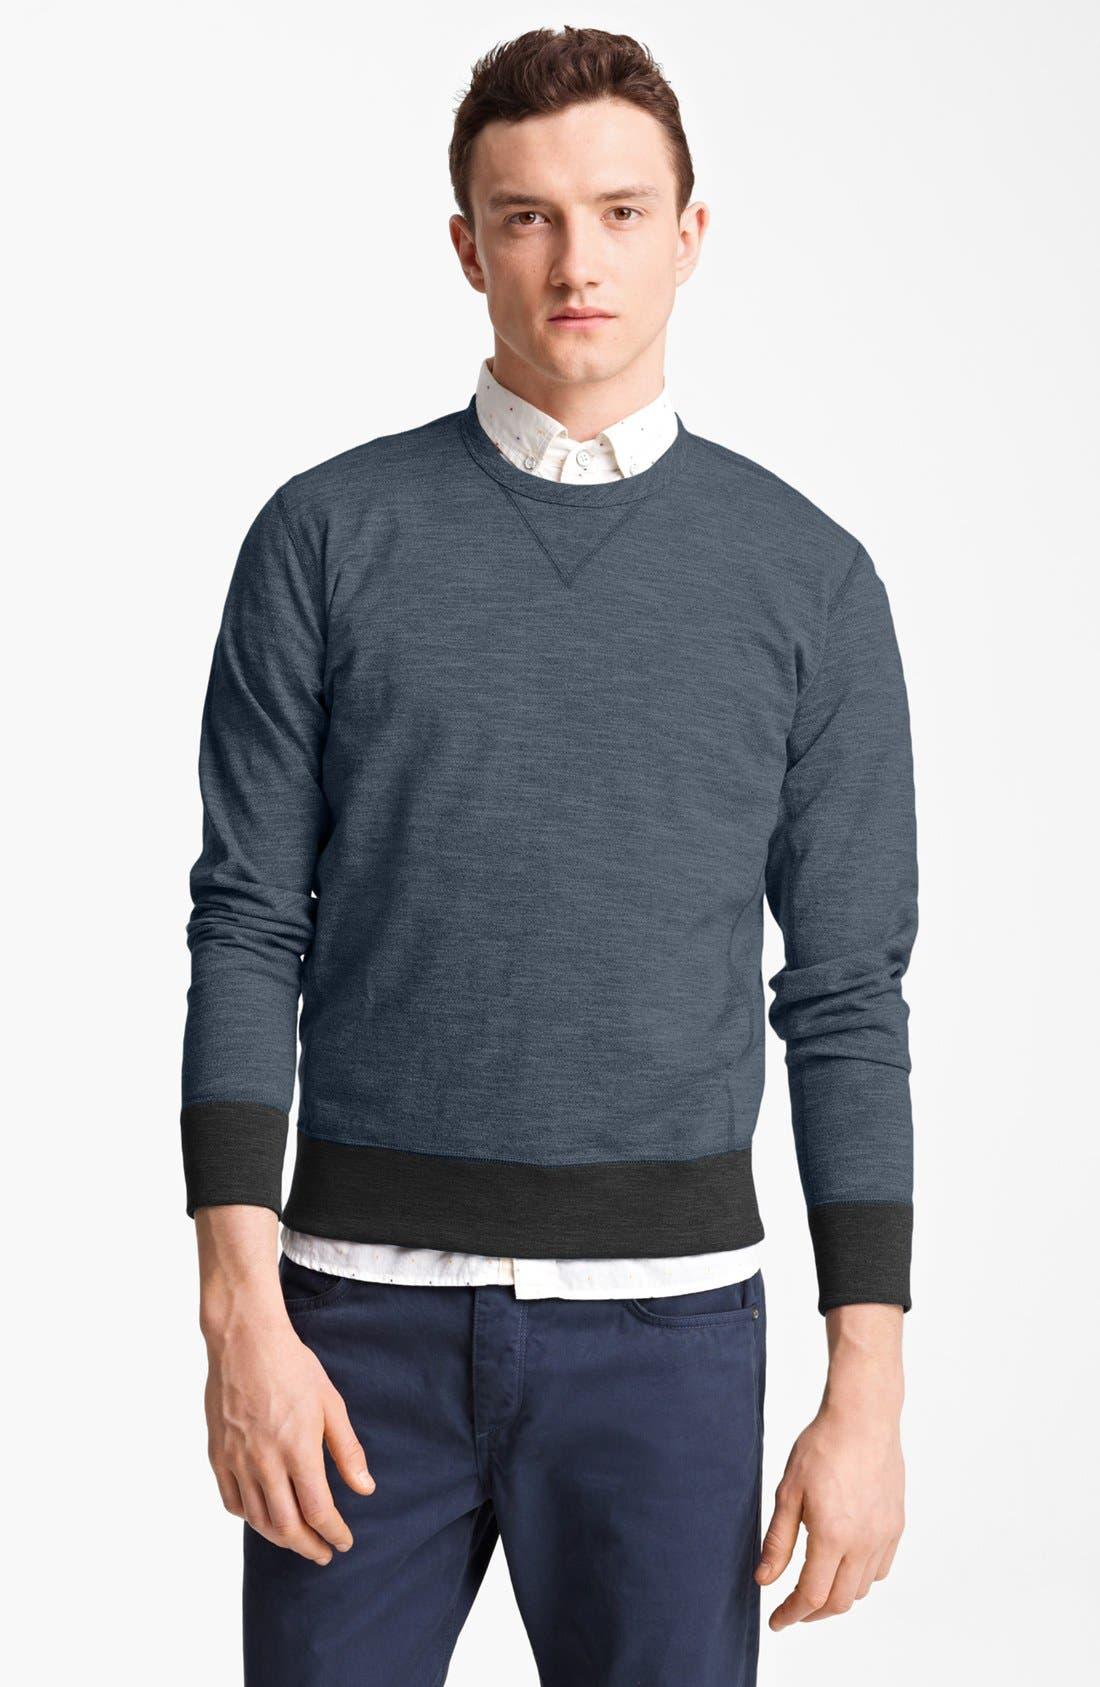 Alternate Image 1 Selected - rag & bone 'Moulinex' Crewneck Sweatshirt